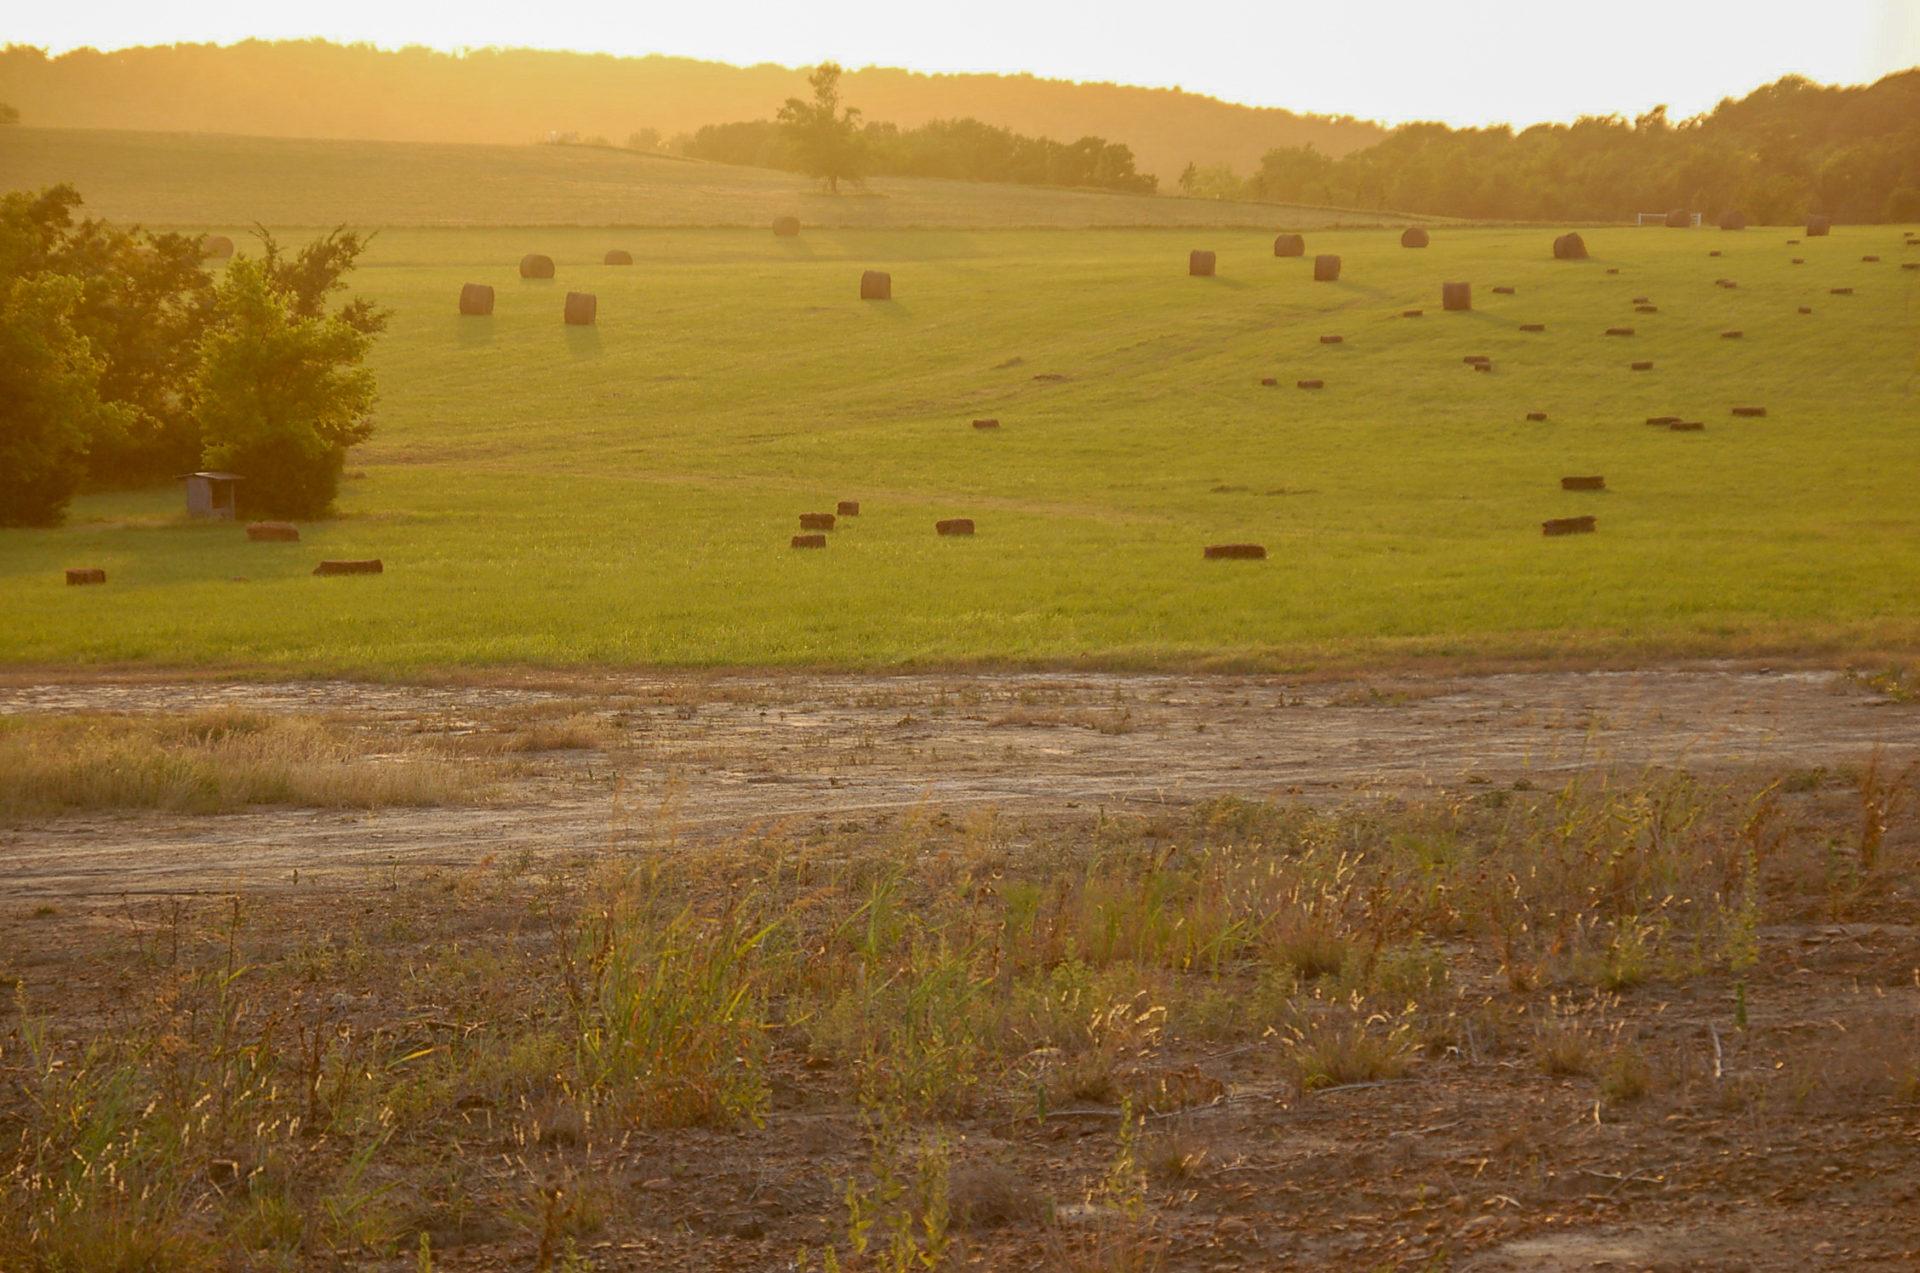 Die grünen Hügel Oklahomas bei der Dude Ranch Meadow Lake an der Route 66